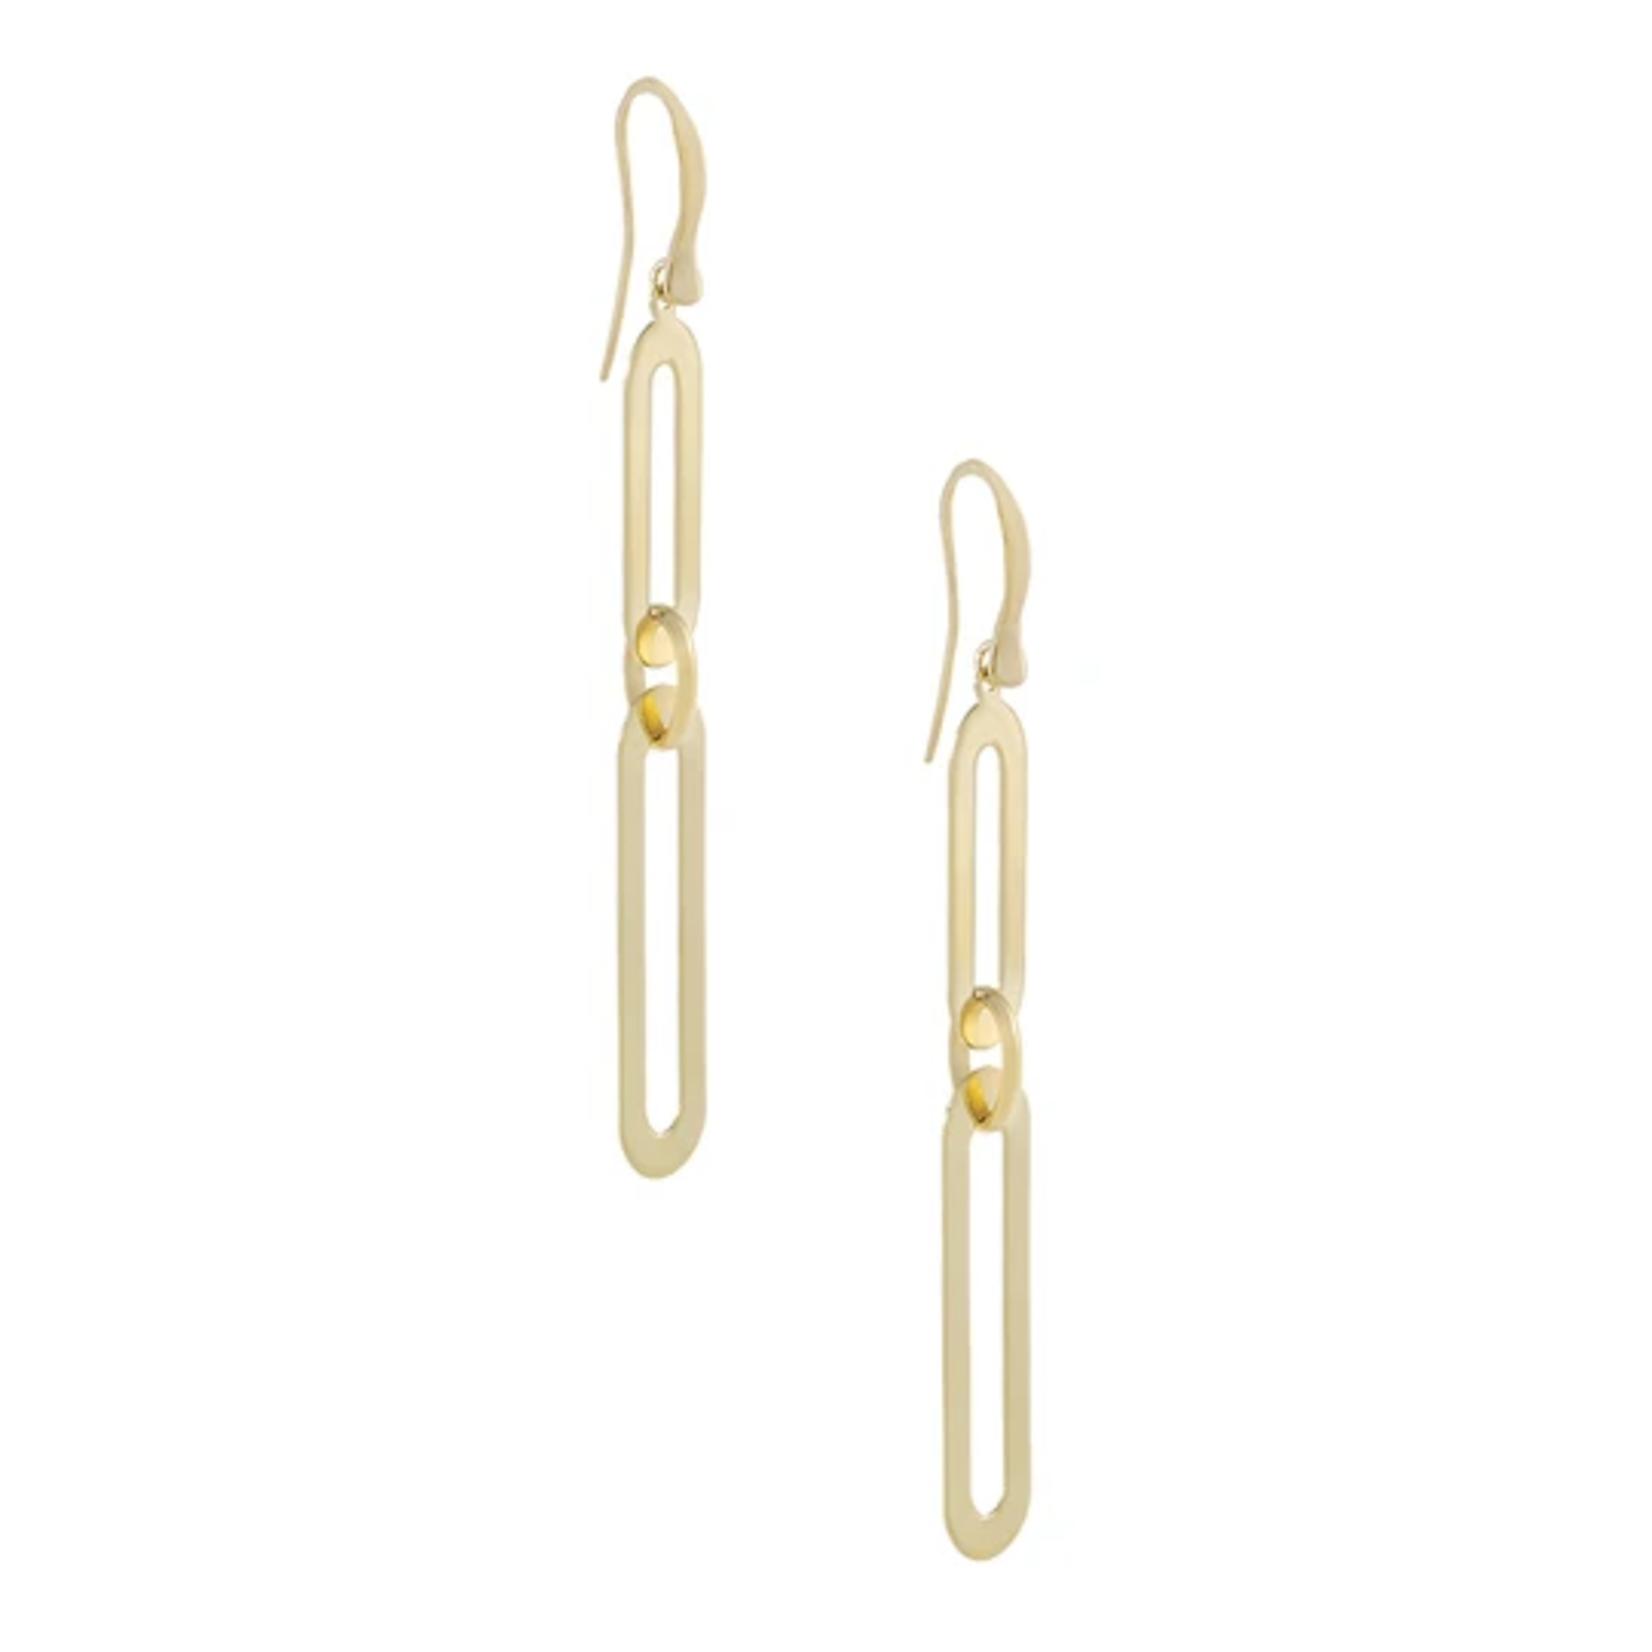 Adinas Large Paperclip Threader Drop Earring 14K